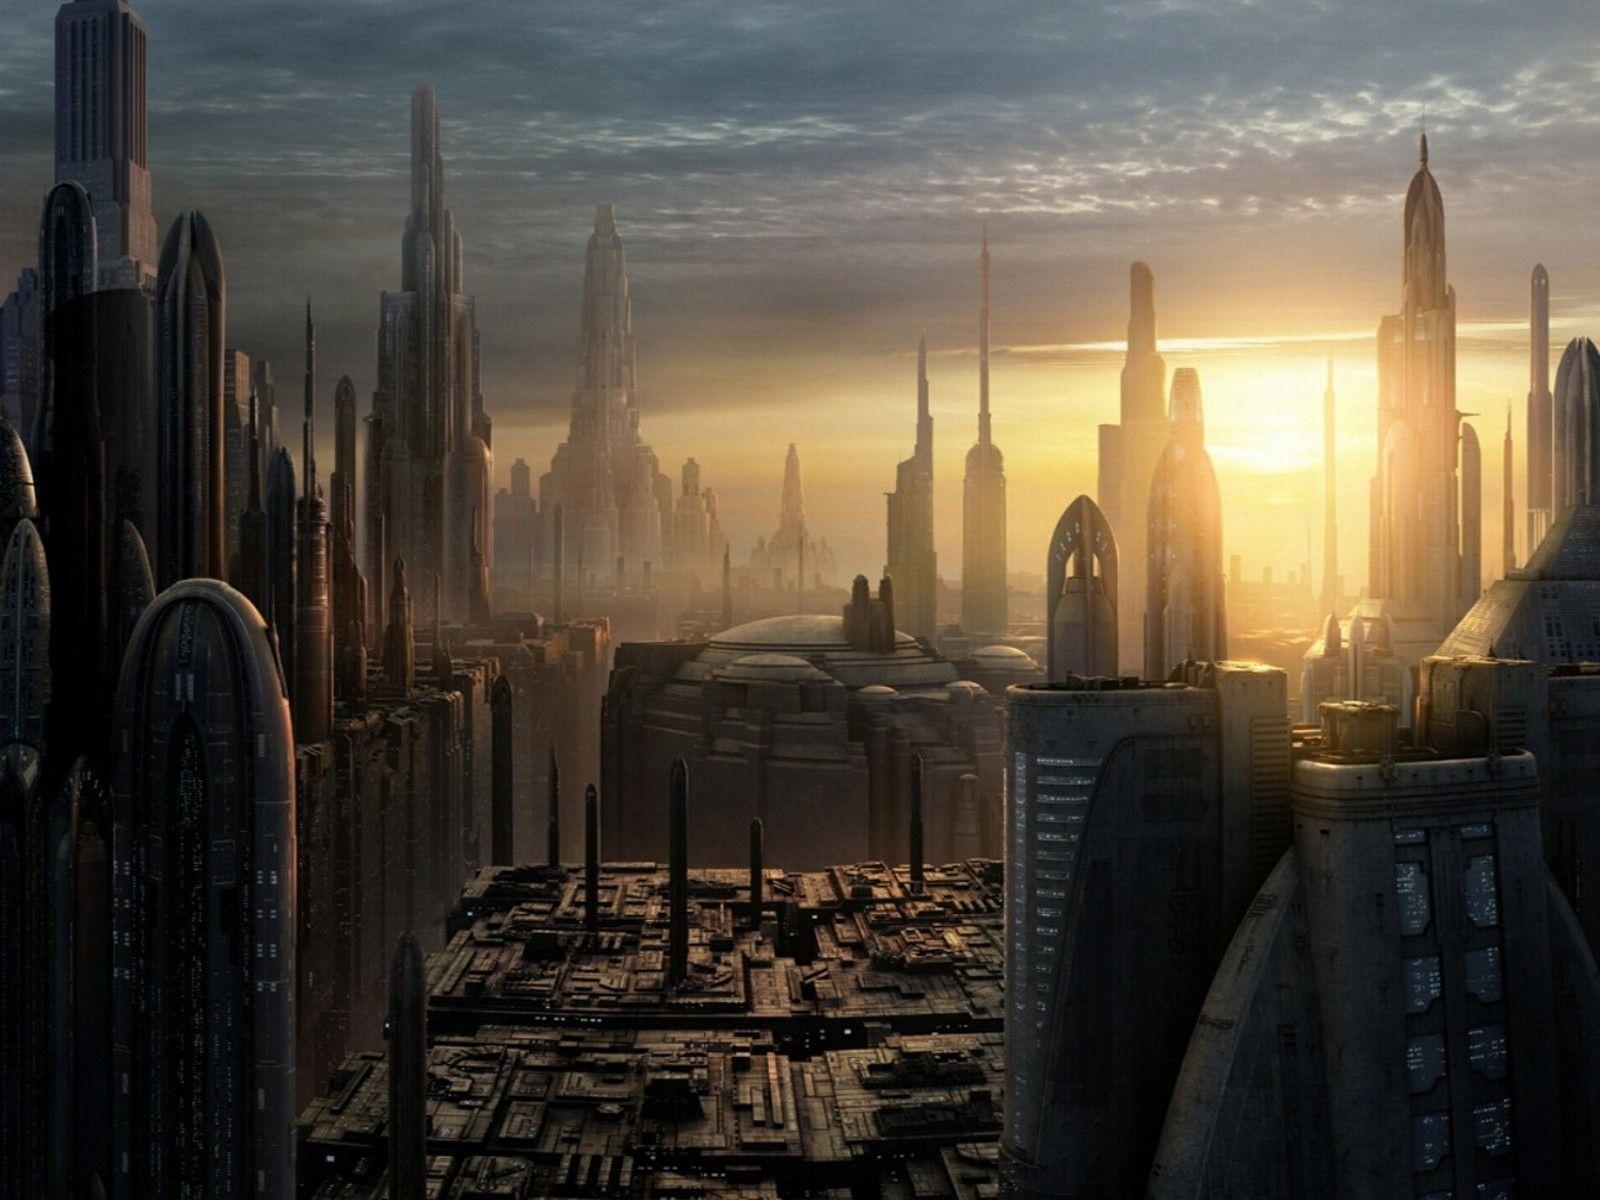 wall-e city - Cerca amb Google